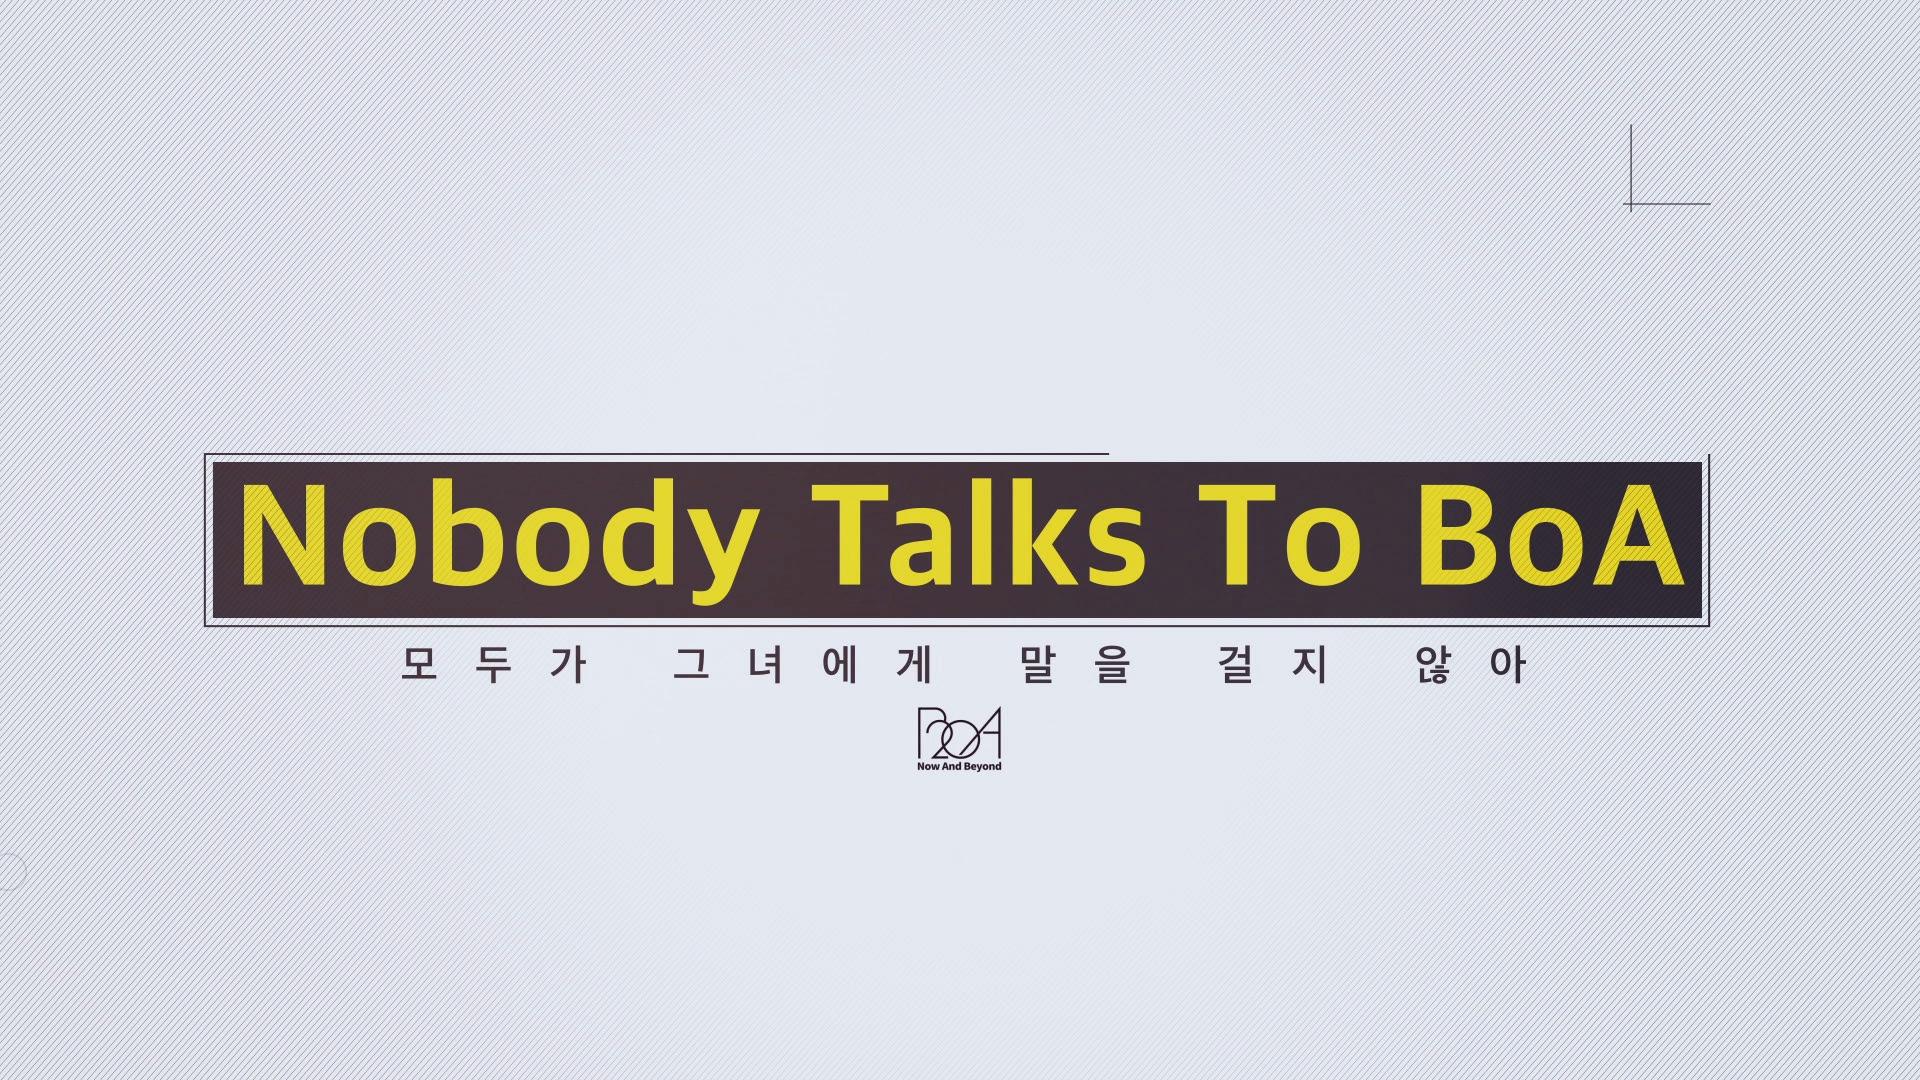 'Nobody Talks To BoA - 모두가 그녀에게 말을 걸지 않아' Teaser